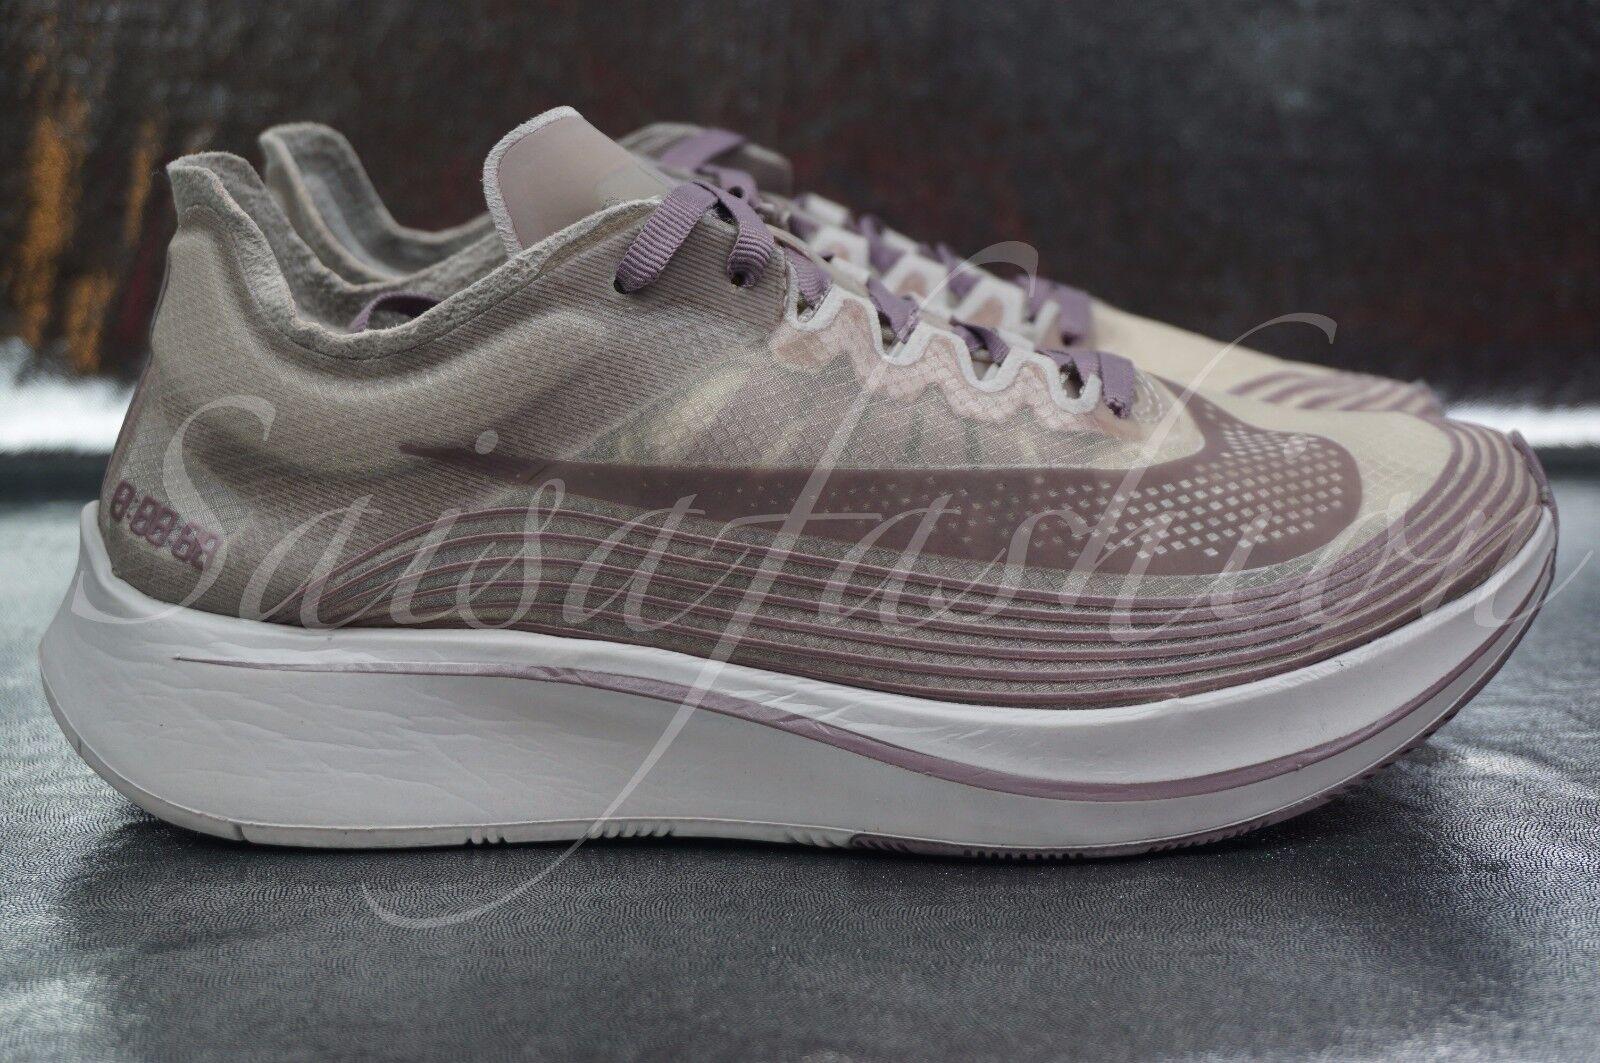 Nike NikeLab Zoom Fly SP Chicago Taupe Grey Obsidian AA3172-200 Men's Sz 8.5